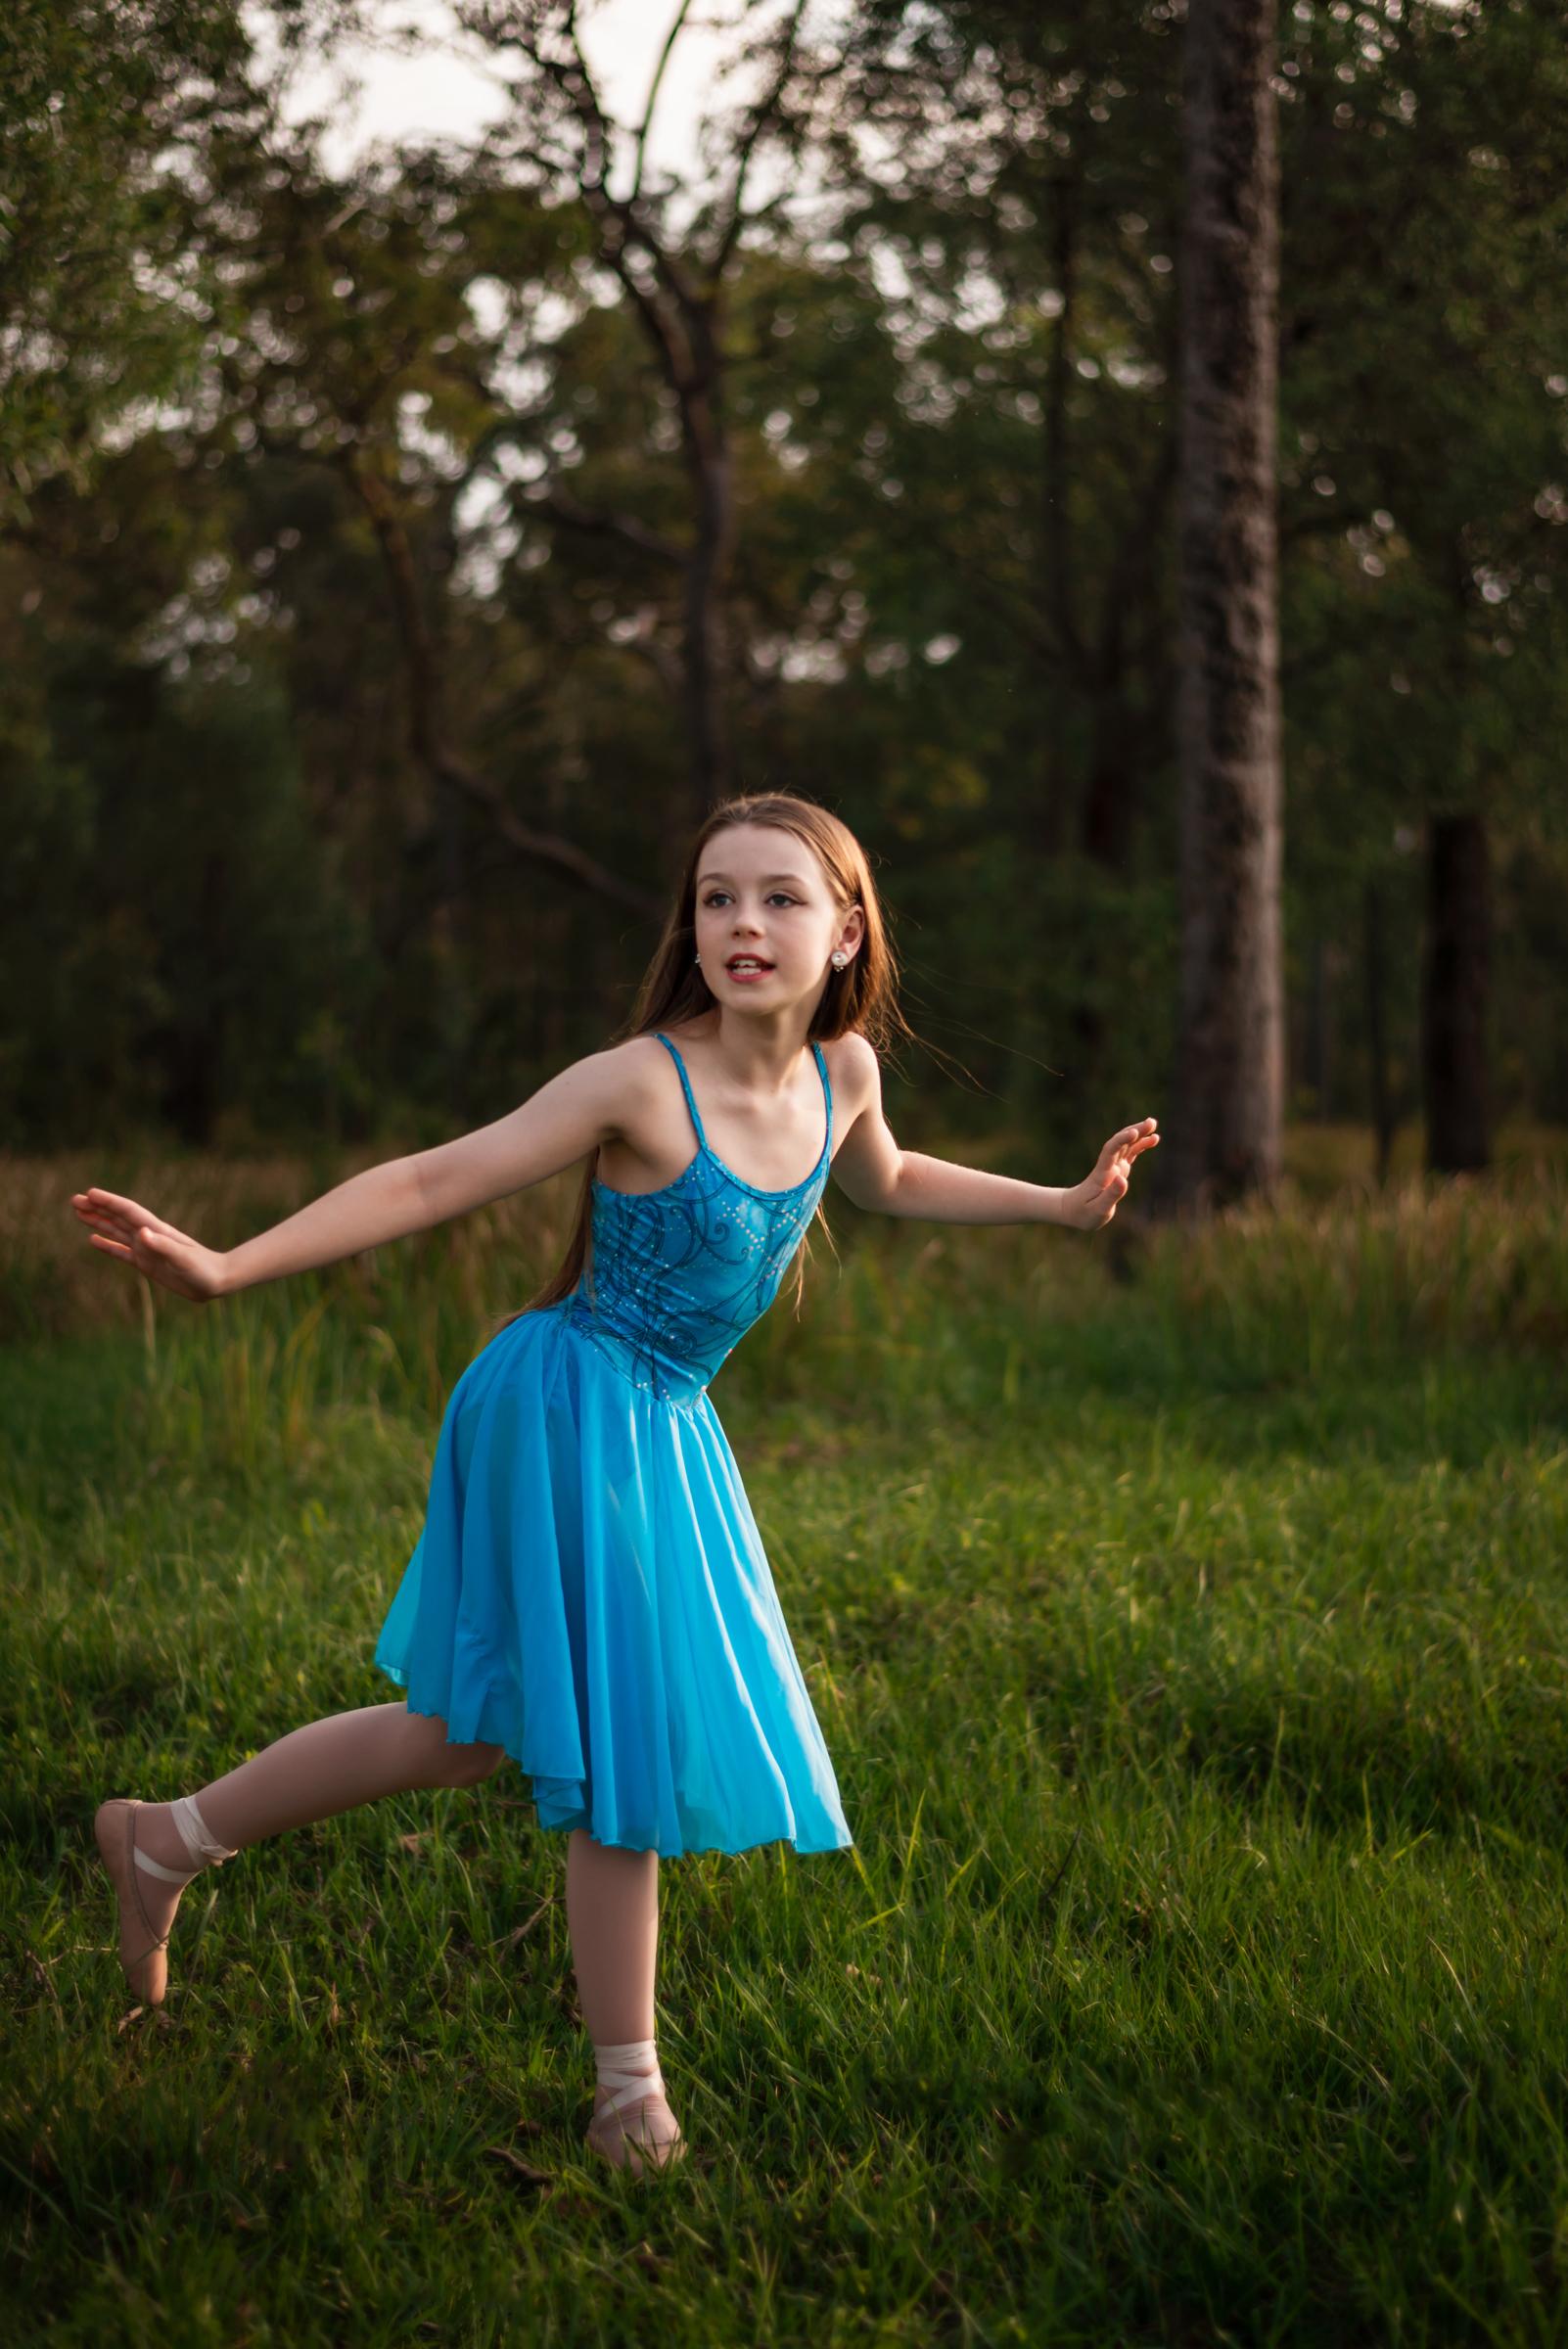 Young Brisbane dancer in blue dress